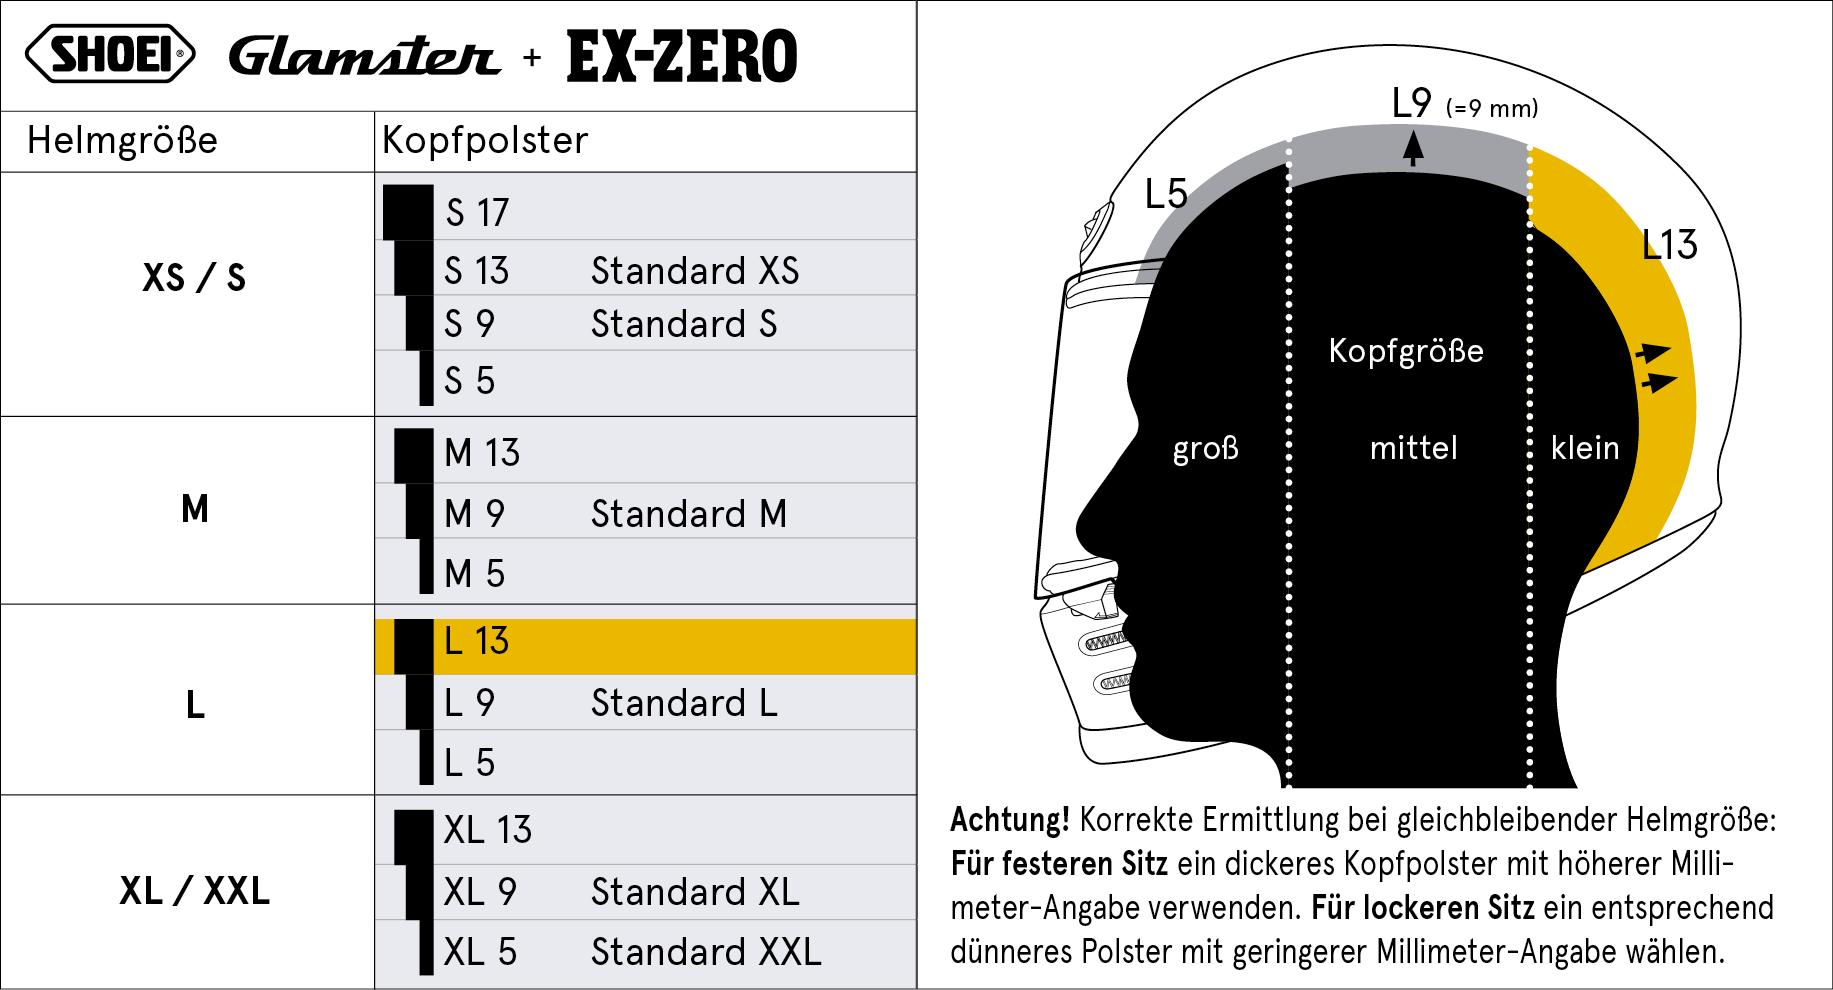 SHOEI EX-Zero & Glamster Innenfutter Größentabelle